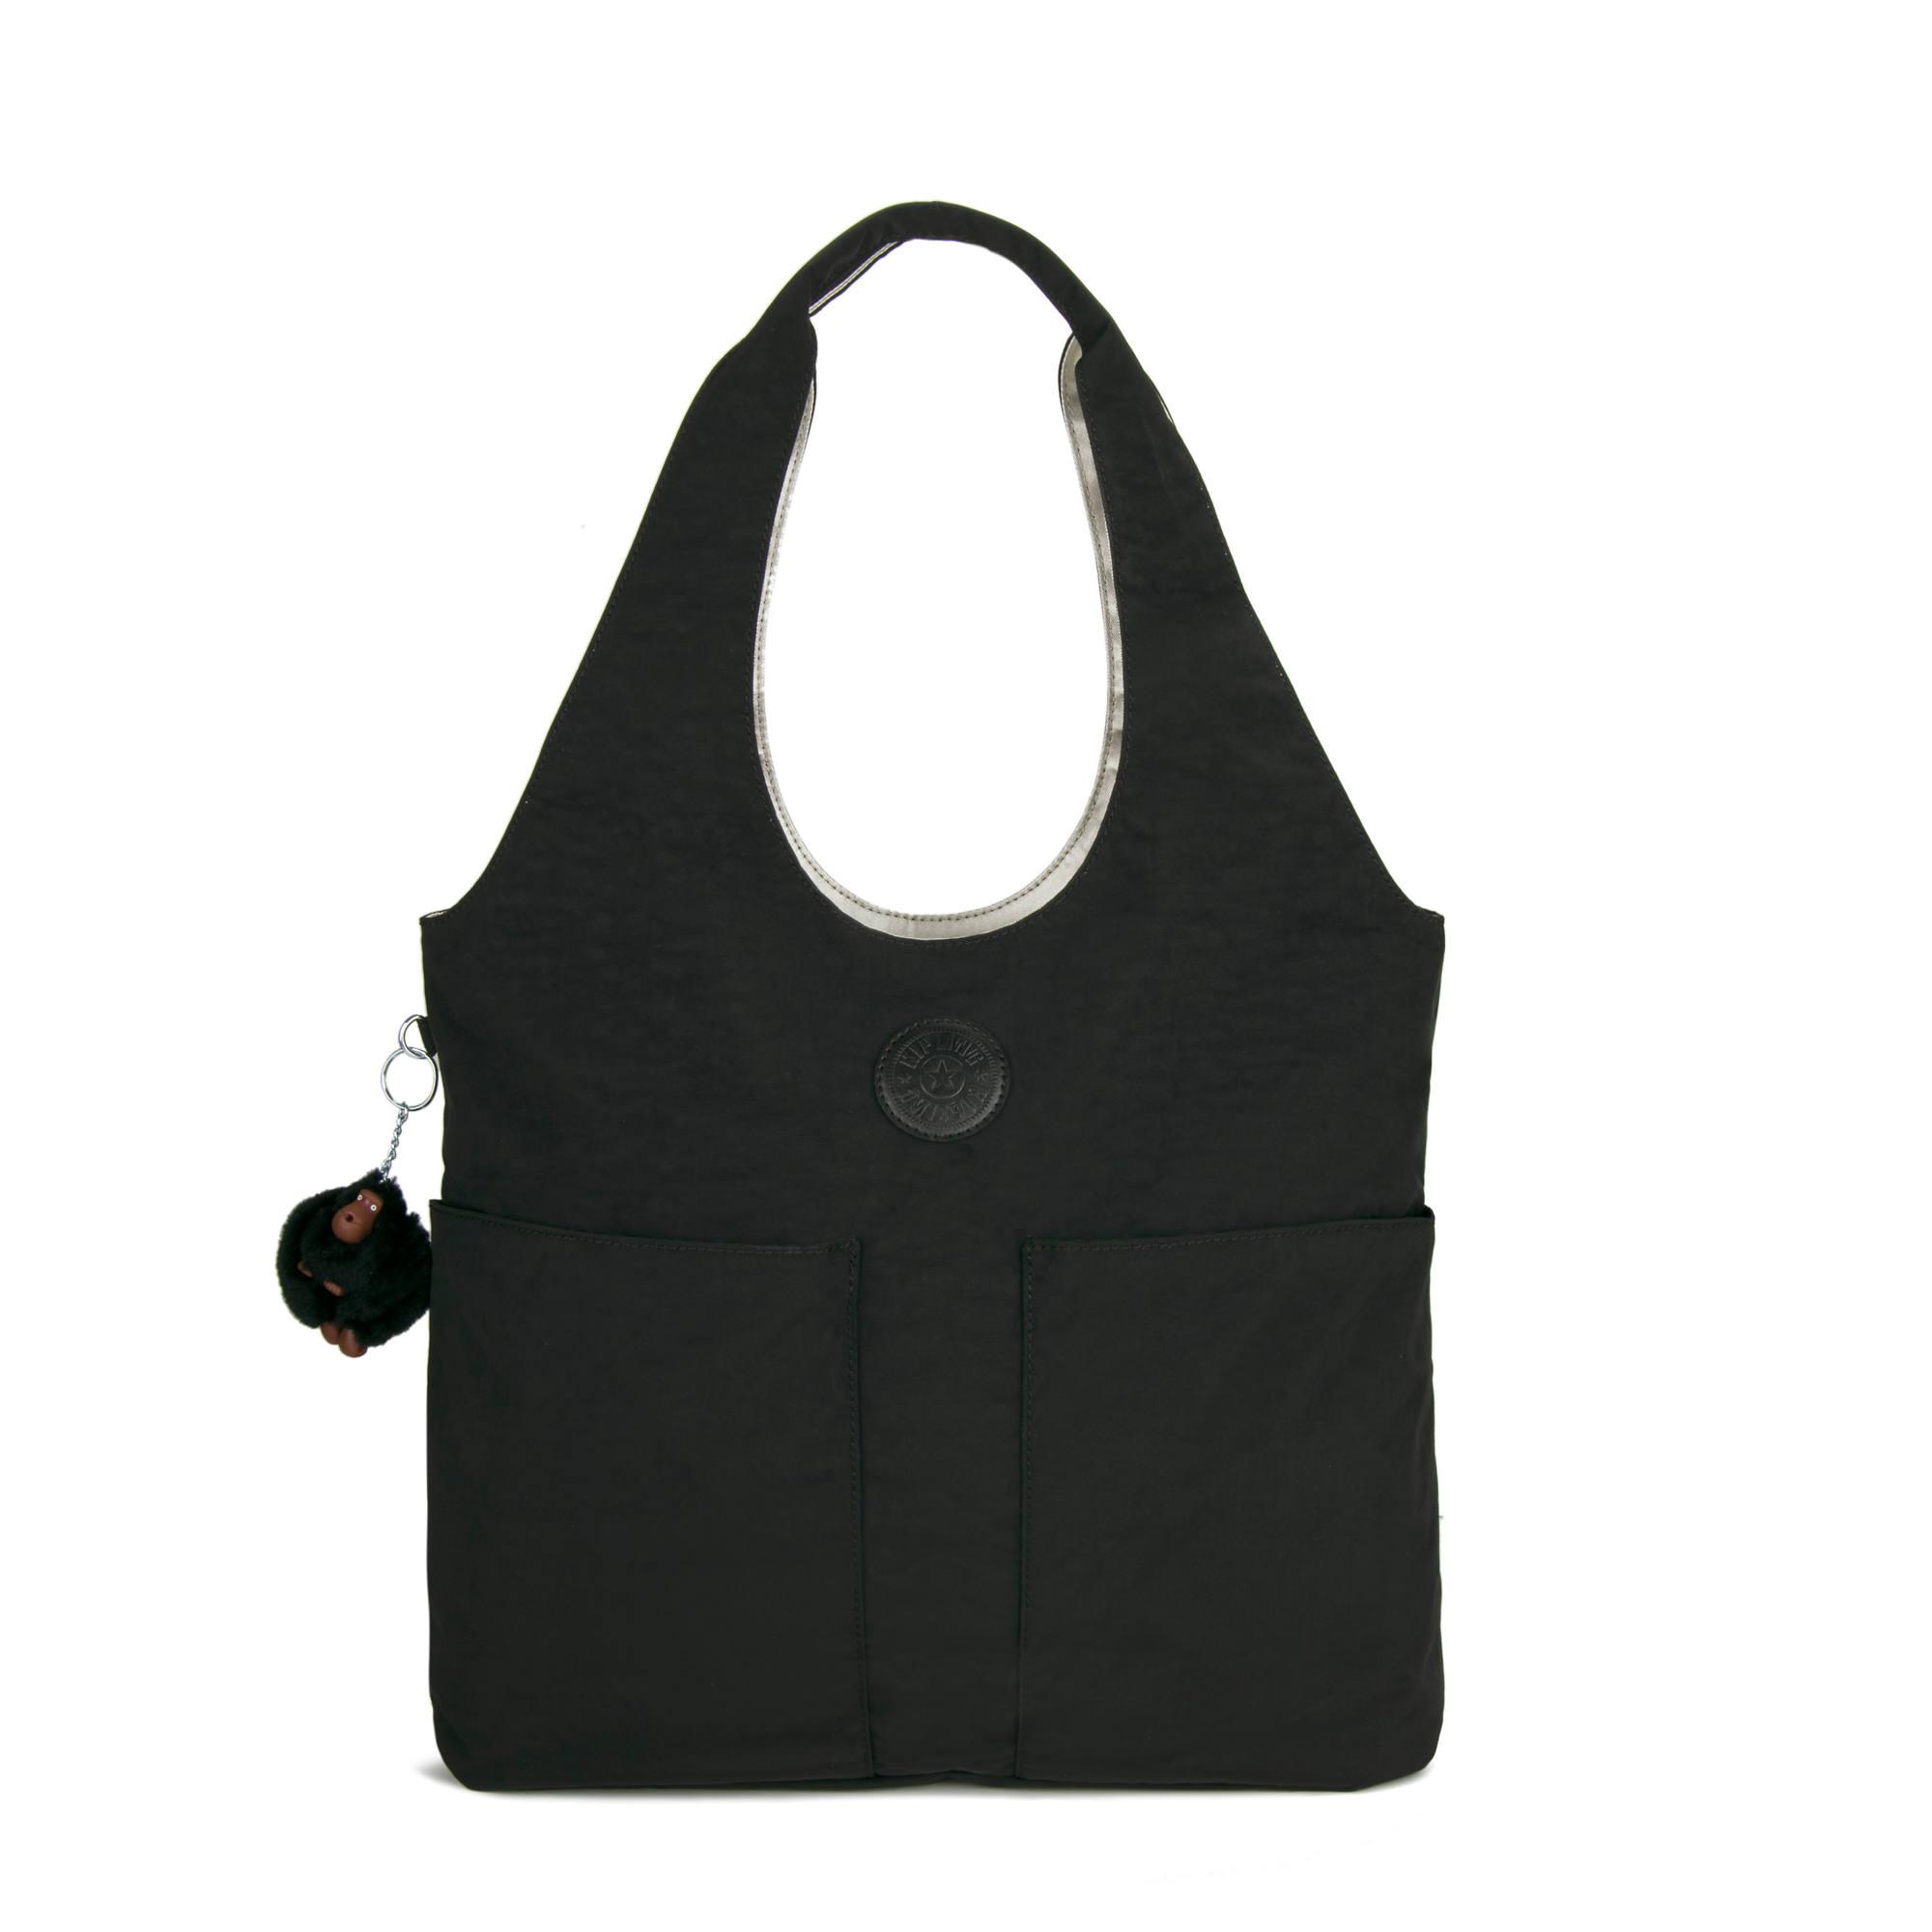 Astrid Shoulder Bag,Black Cloud Tonal Zipper,large-zoomed